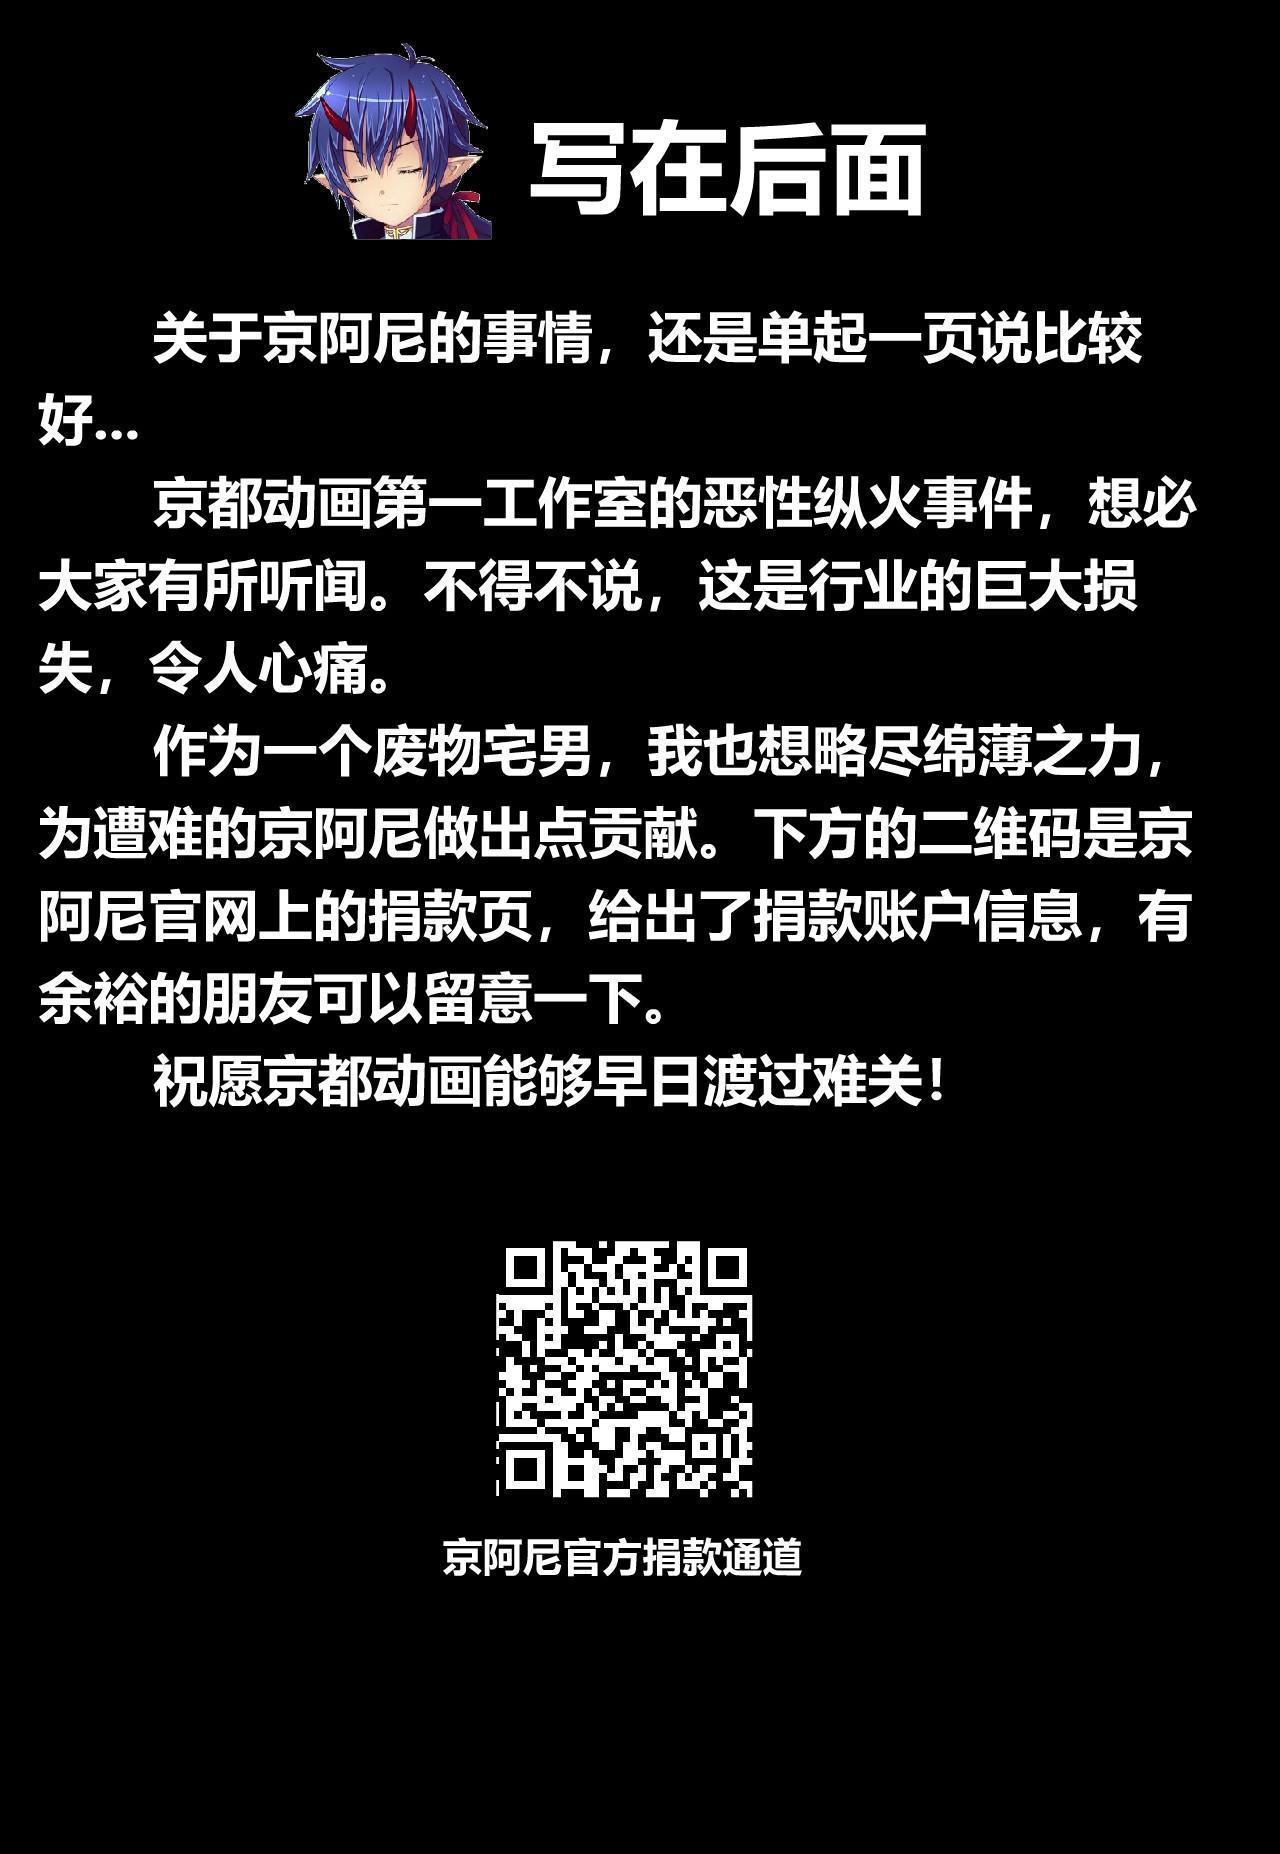 [Waffle Doumeiken (Tanaka Decilitre)] Inmon Megumin - Crotch Tattoo Megumin! (Kono Subarashii Sekai ni Syukufuku o!) [Chinese] [海市个人汉化]] 18